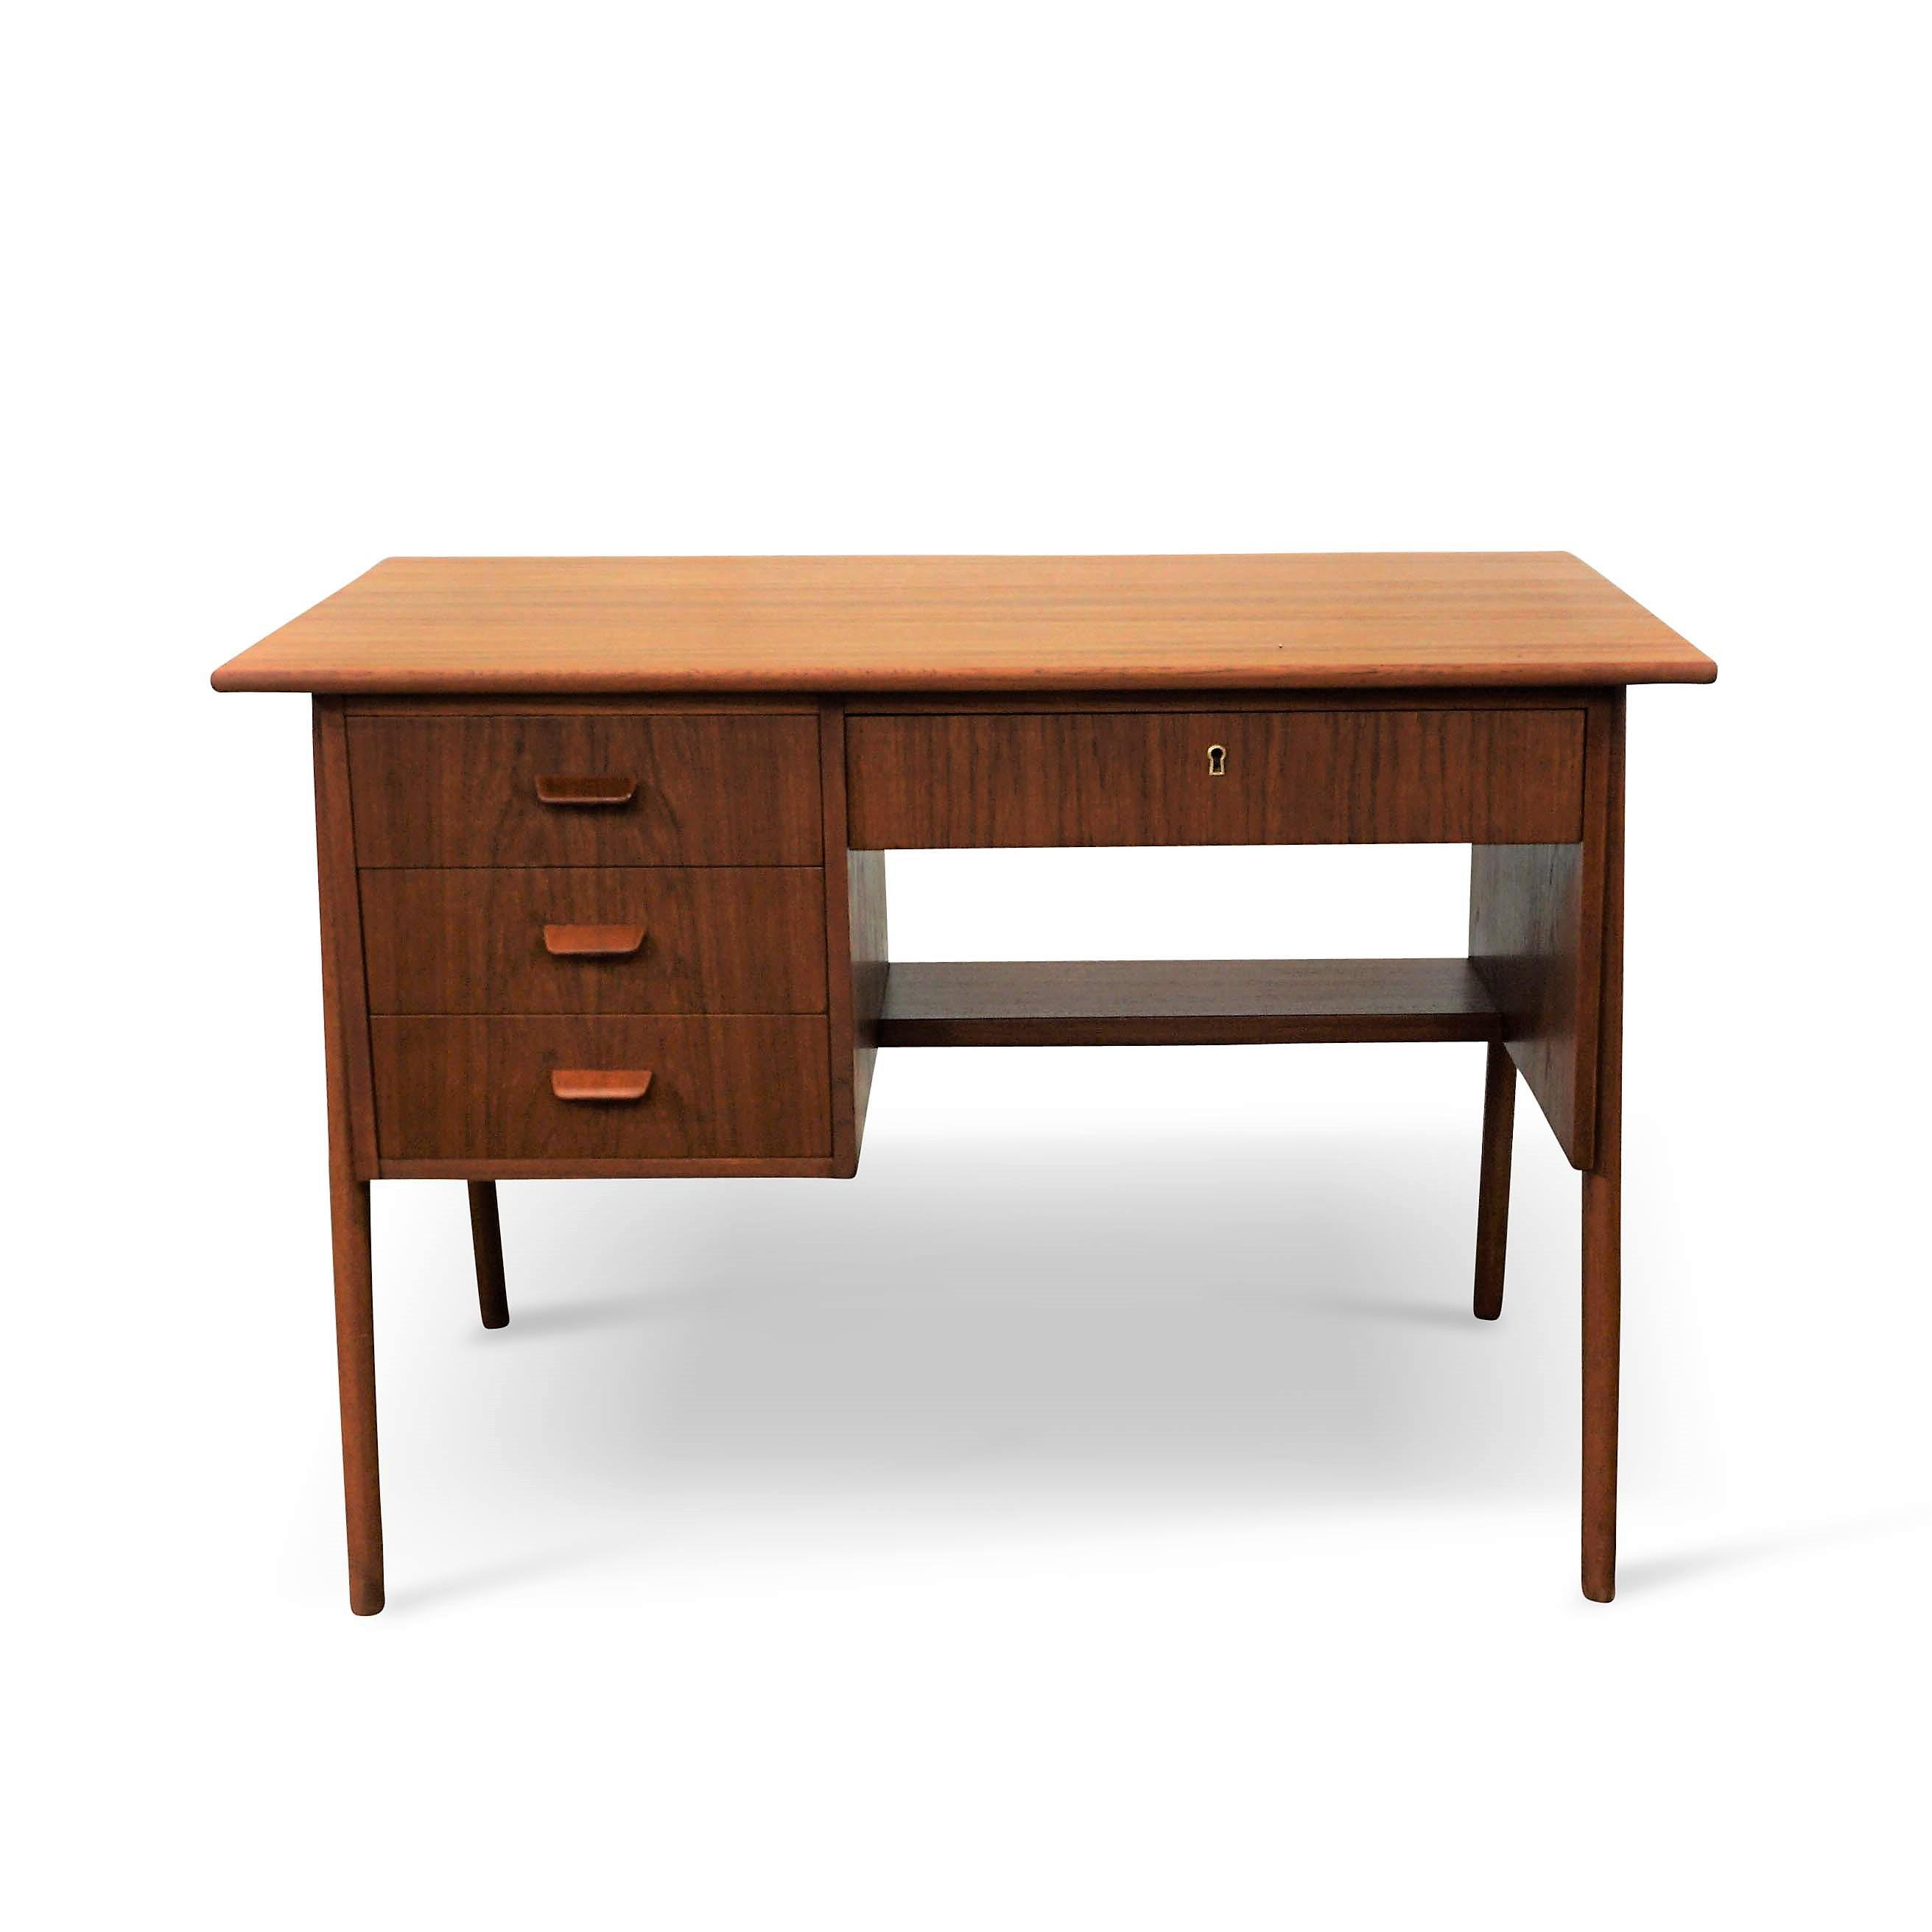 Producer: Danish Furniture Makers Model: Desk Time Period: 1950´s  Dimensions: